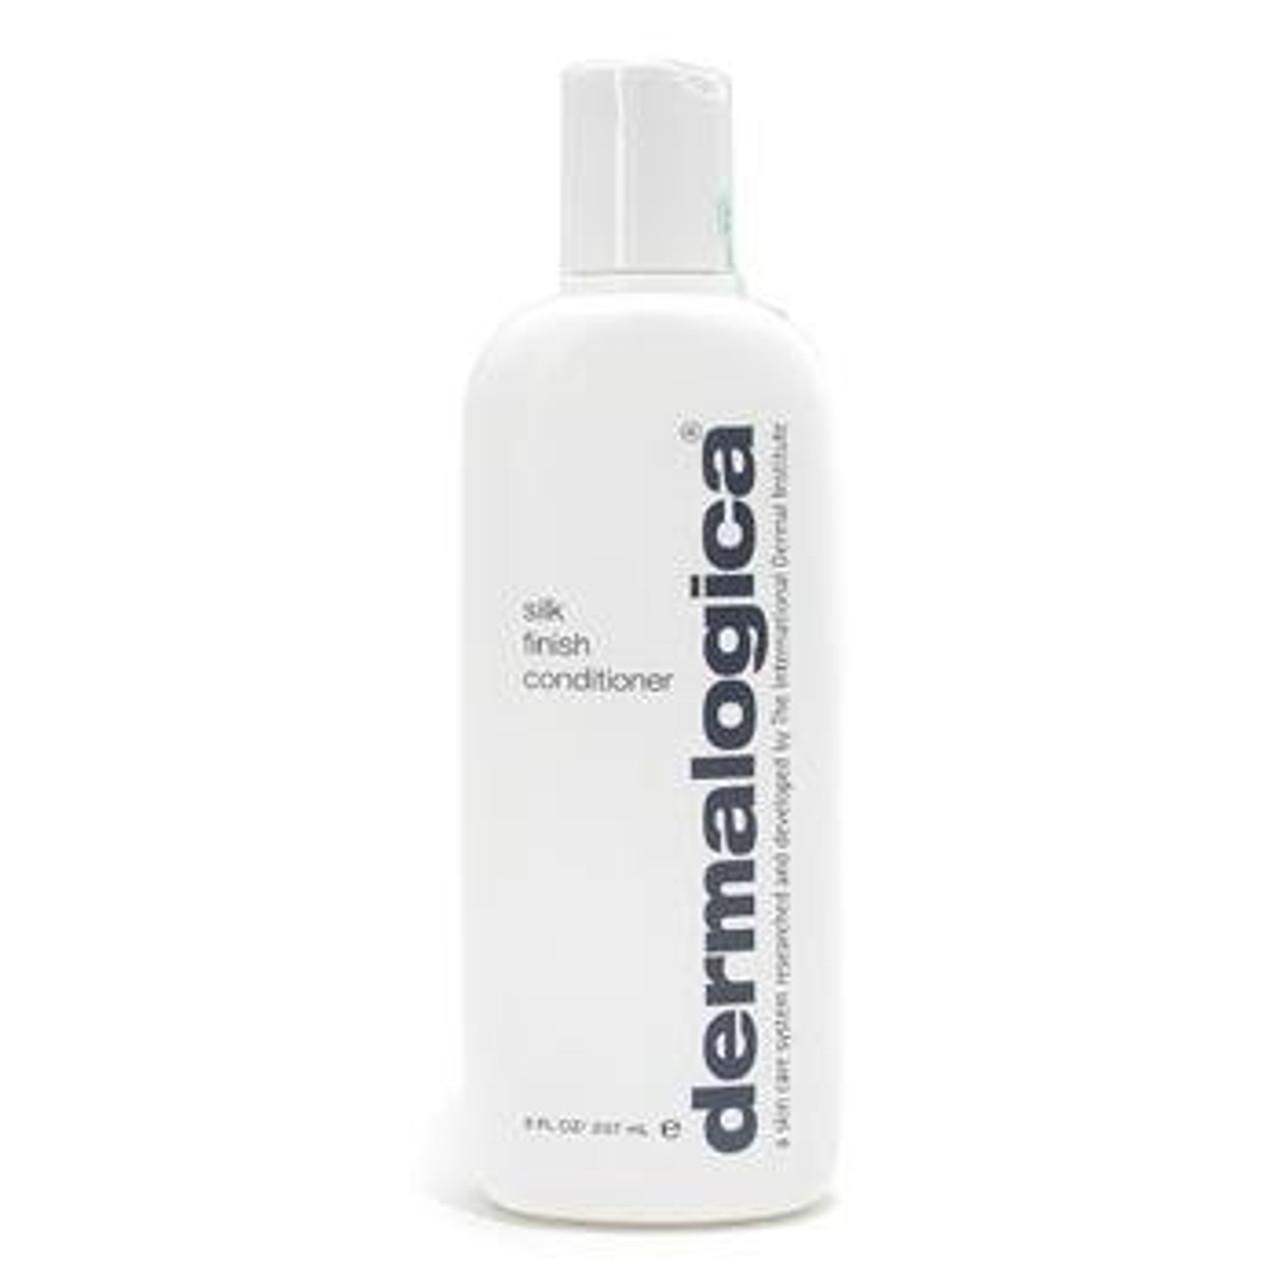 Dermalogica Silk Finish Conditioner